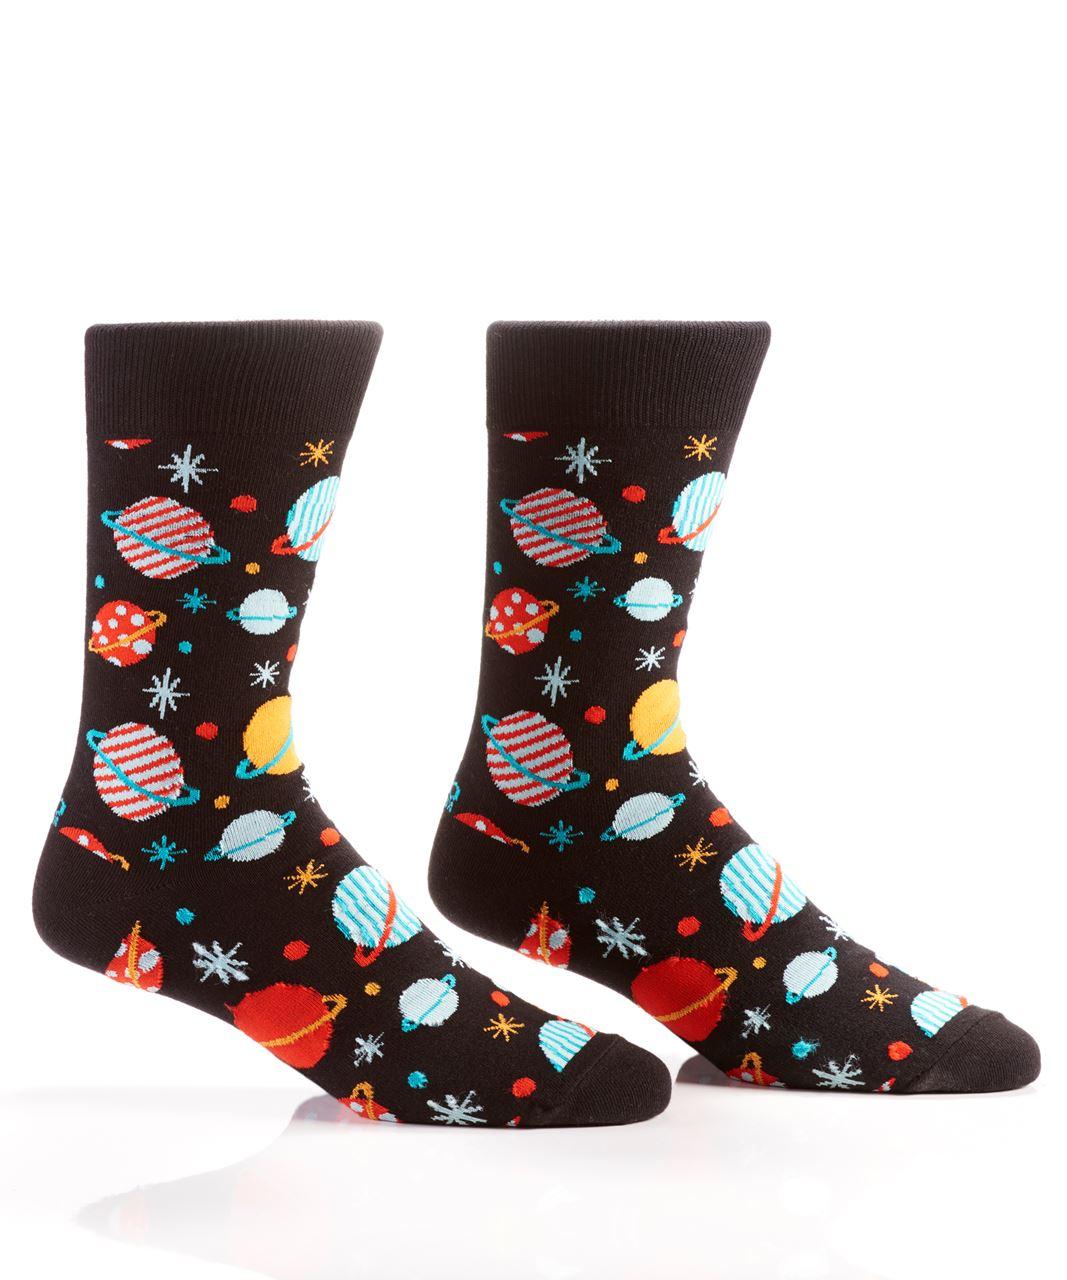 Galaxy Crew Socks by Yo Sox